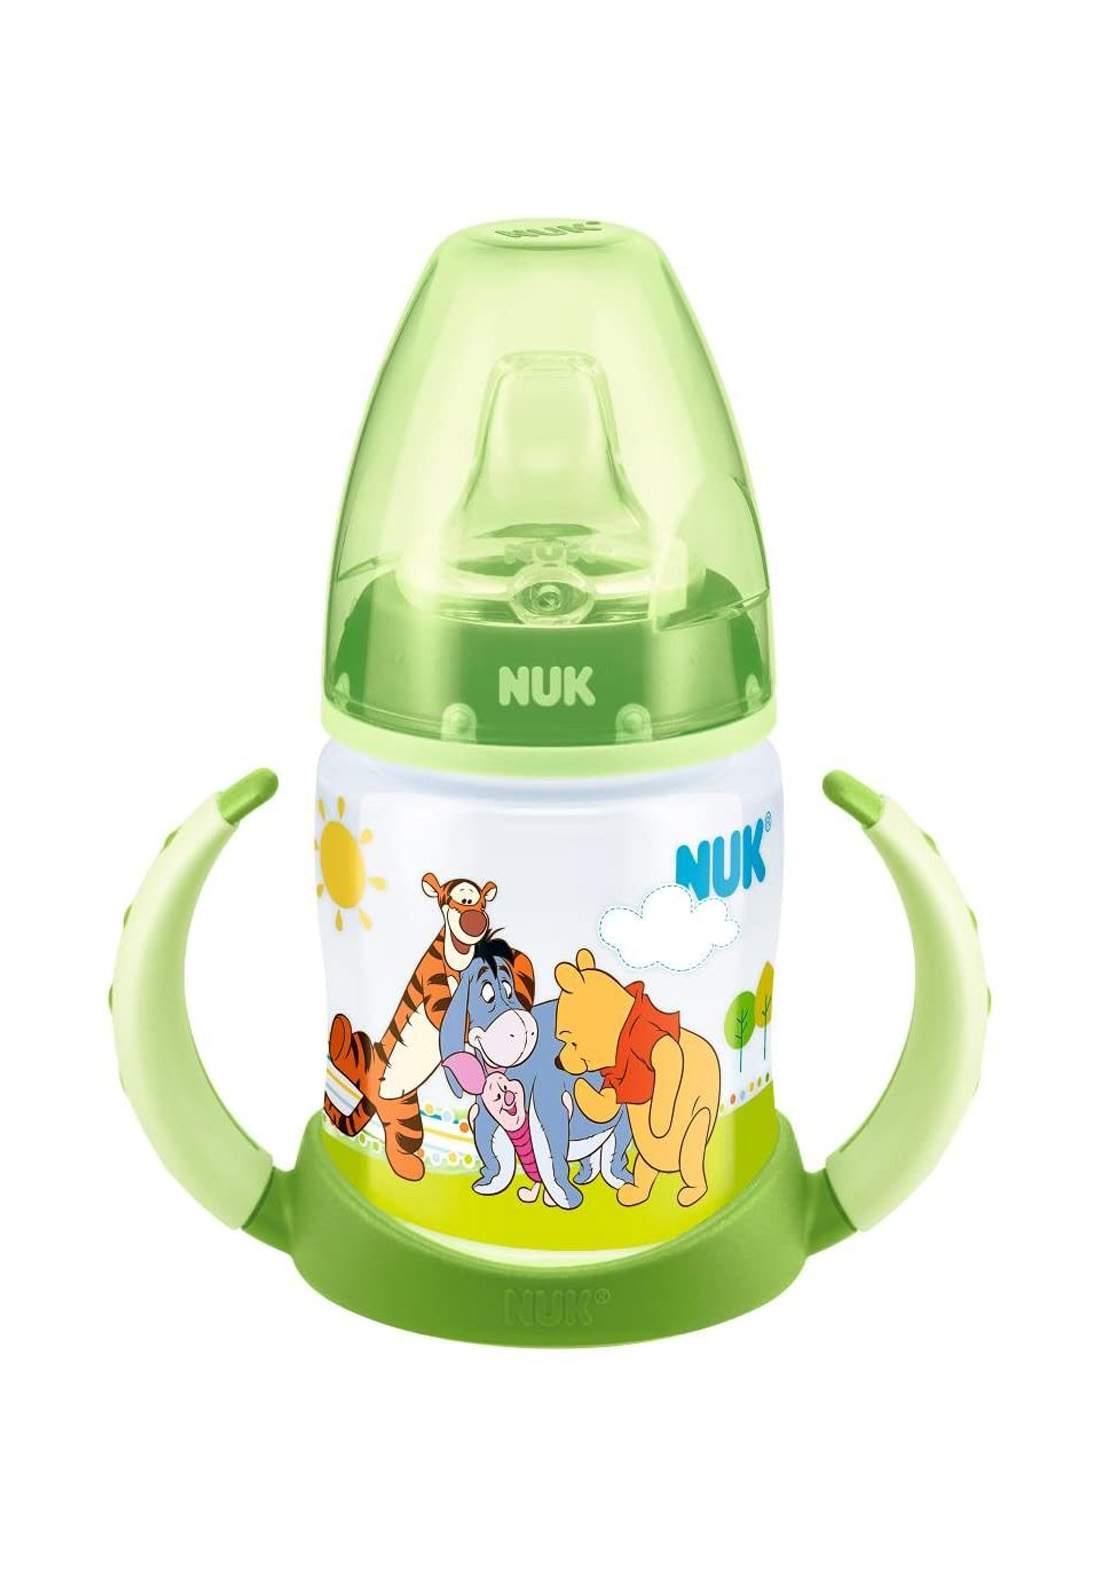 Nuk First Choice PP Learner Bottle Winnie the Pooh 150ml (6-18 months) 150ml    رضاعة أطفال